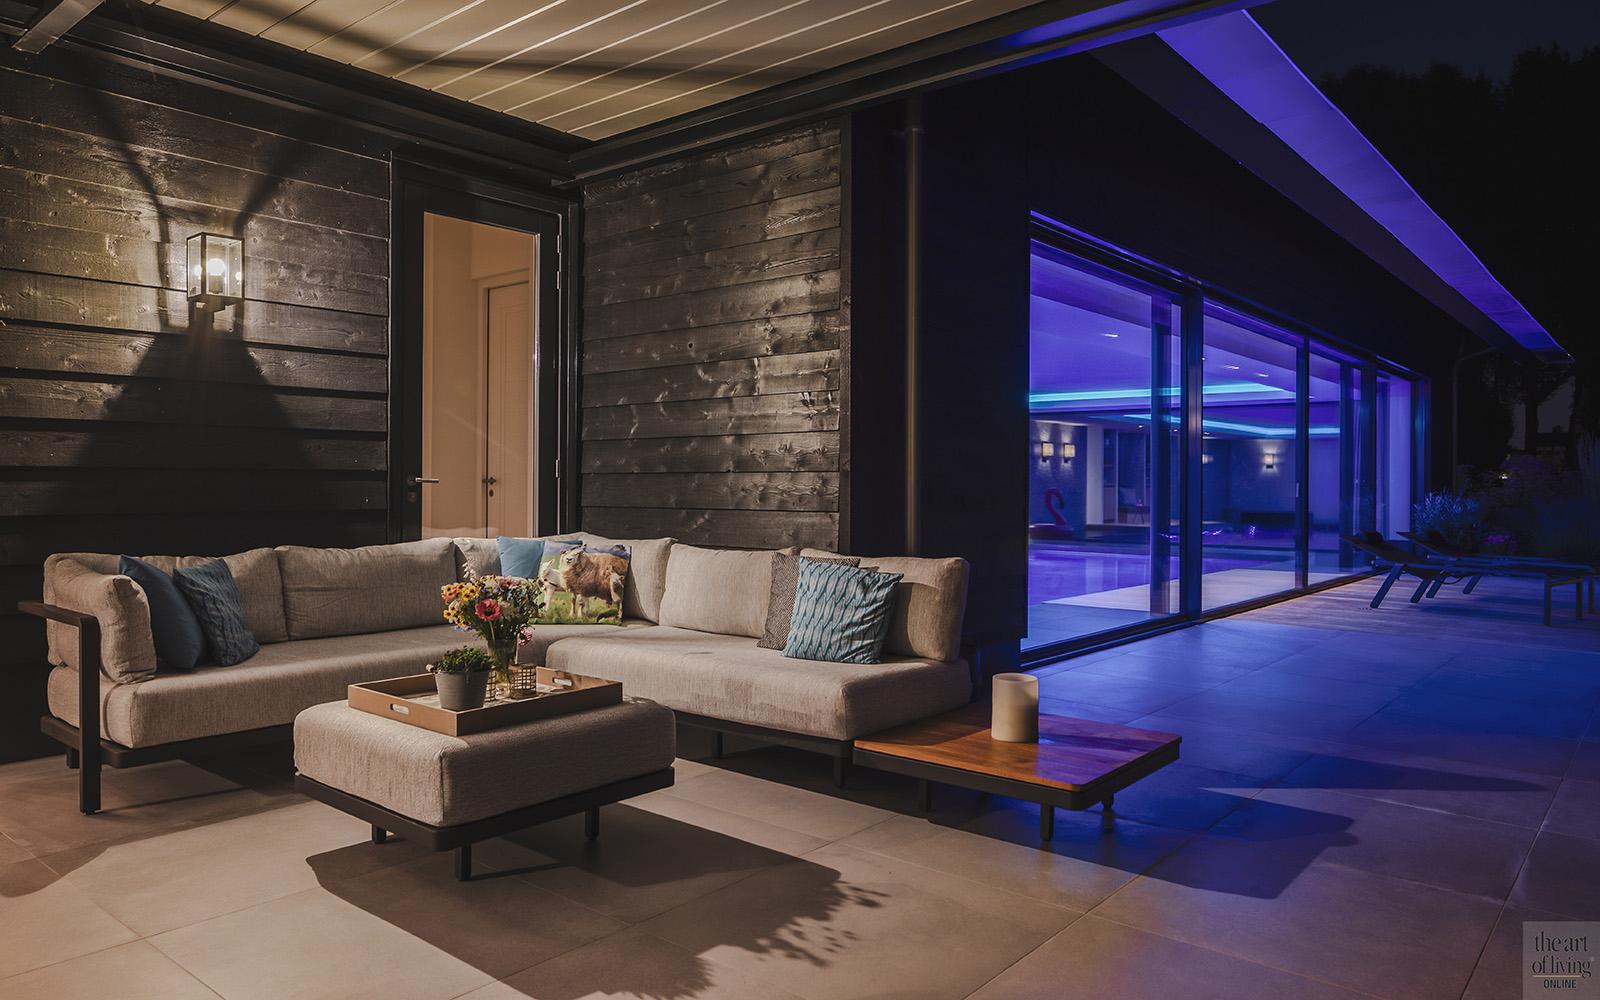 Design interieur versteegh design the art of living nl